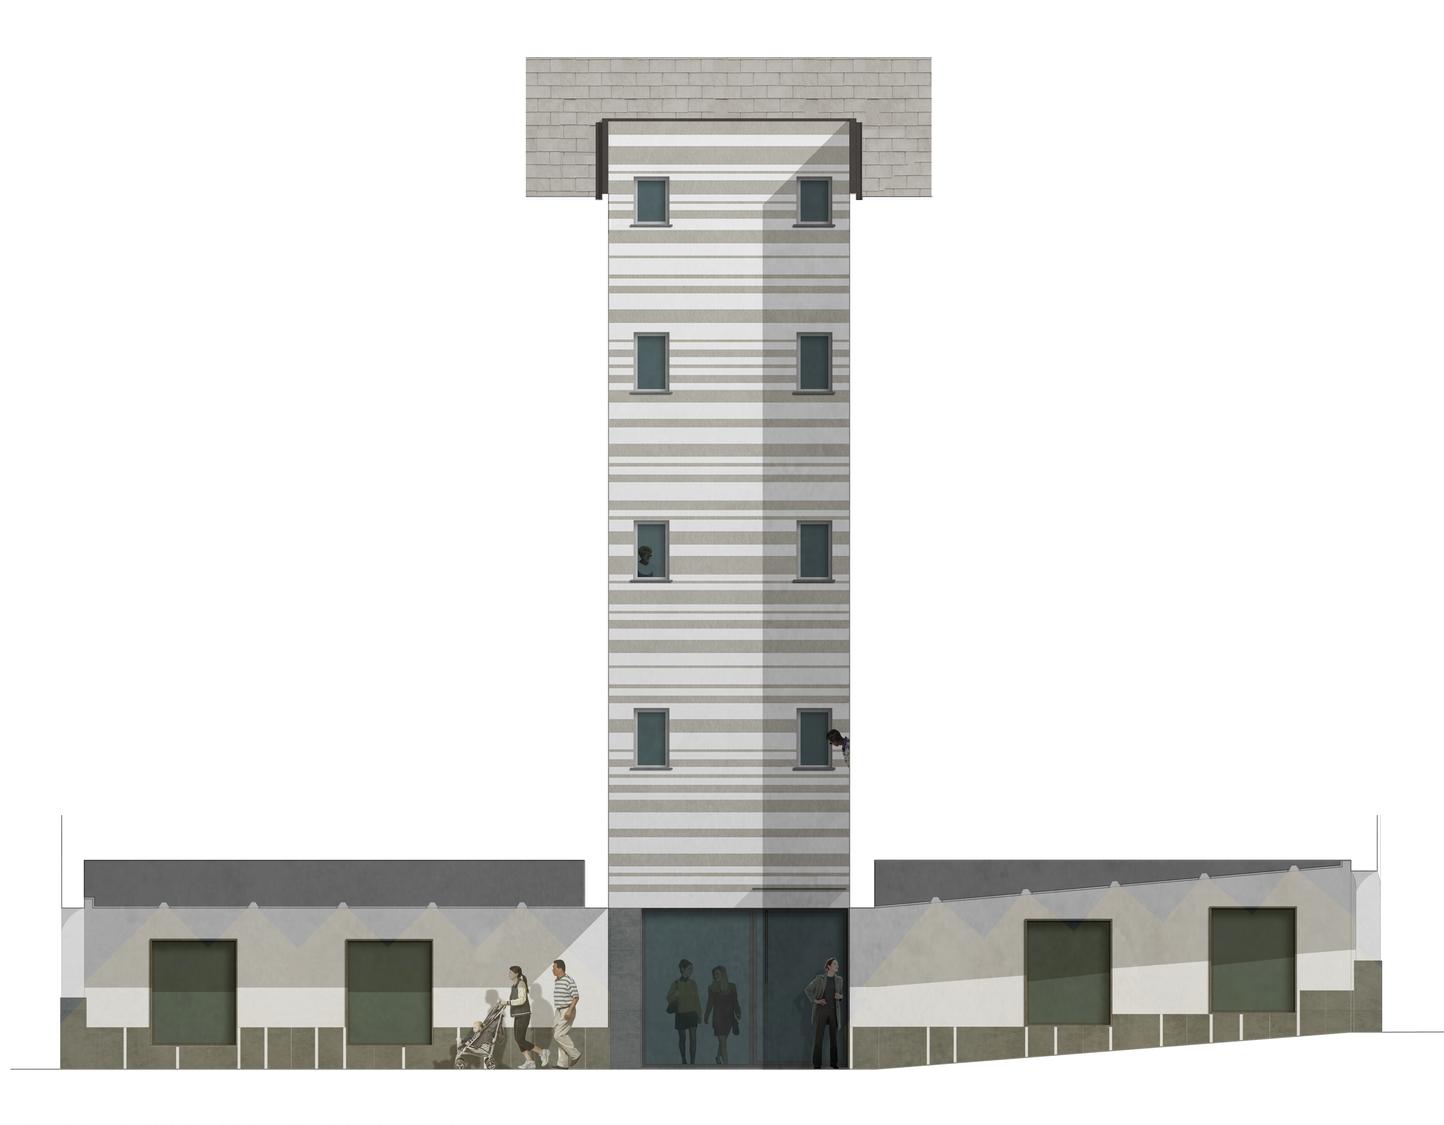 RKTTS_edificio residenziale_DIS 03.jpg